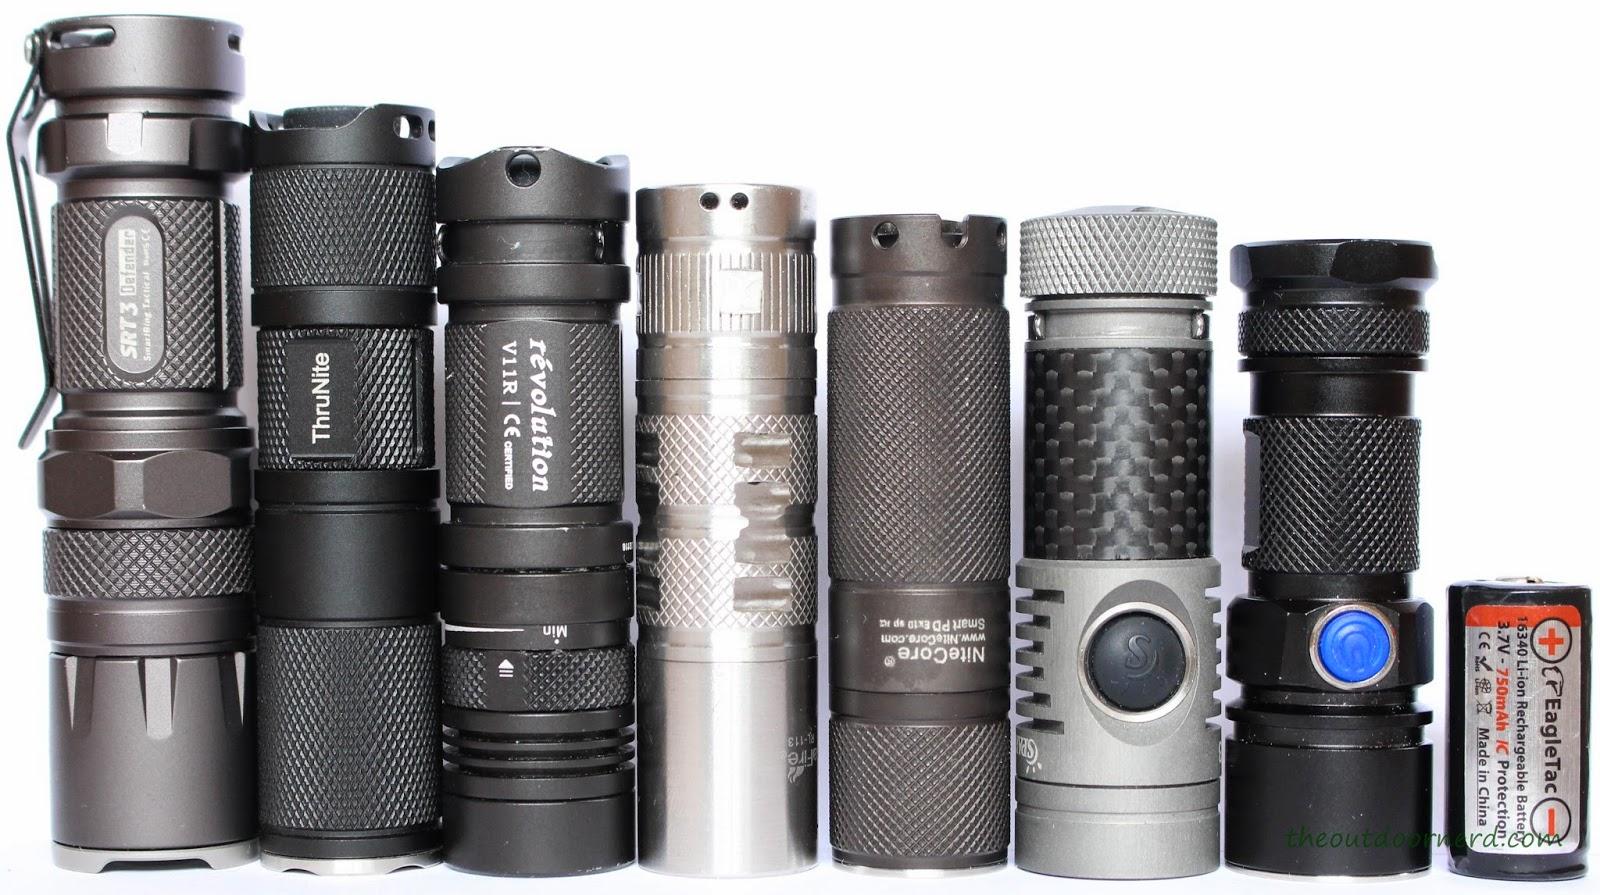 From Left: NiteCore SRT3, Thrunite Neutron 1C, Sunwayman V11R, UltraFire RJ118, Nitecore Ex10, Spark SF3, SolarStorm SC03